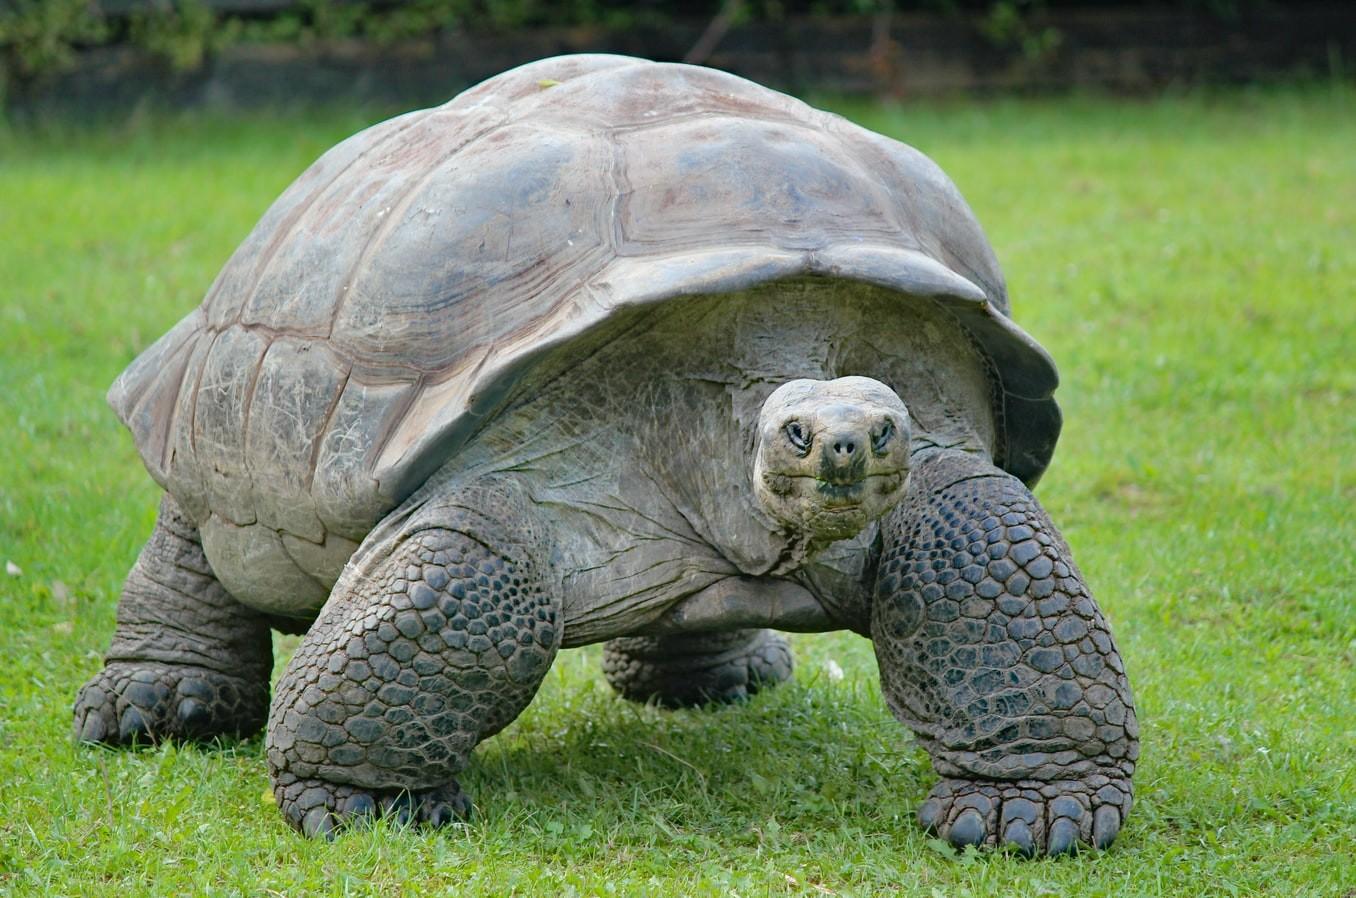 A large tortoise walking in grass. Photo courtesy of Joel M. Mathey on Unsplash.